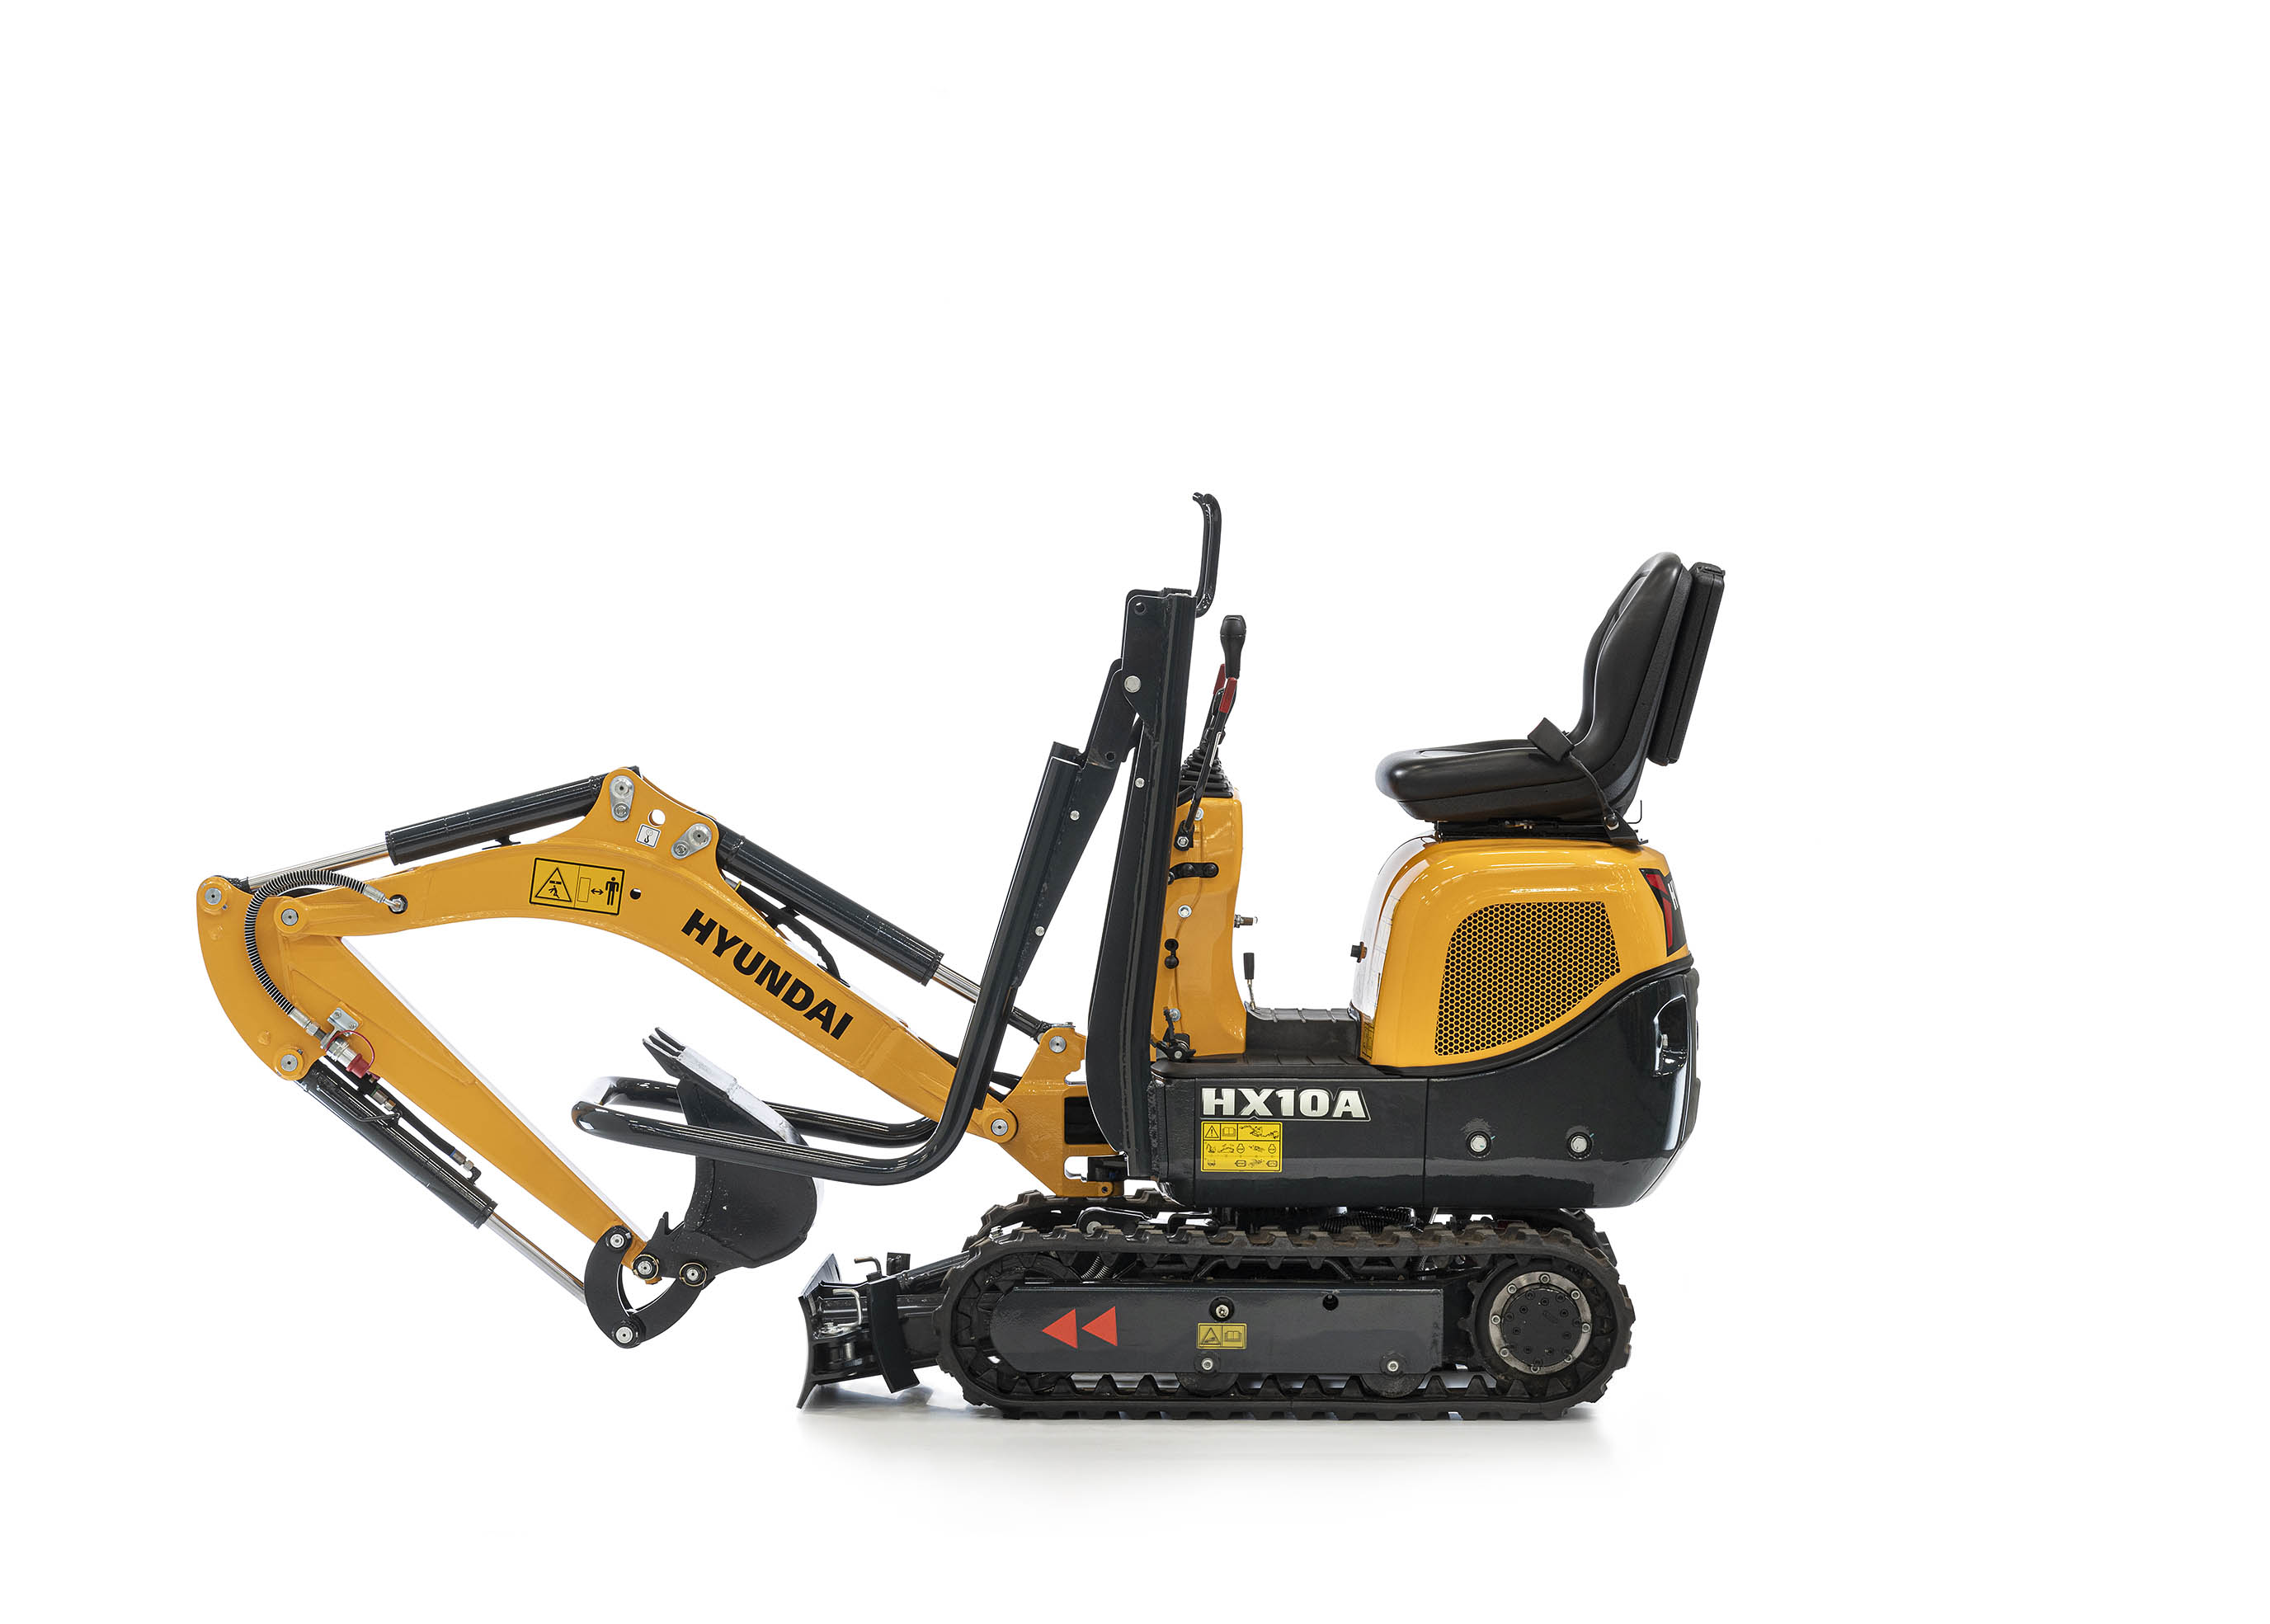 Arthur Los Fotografie - HX10A compact excavator